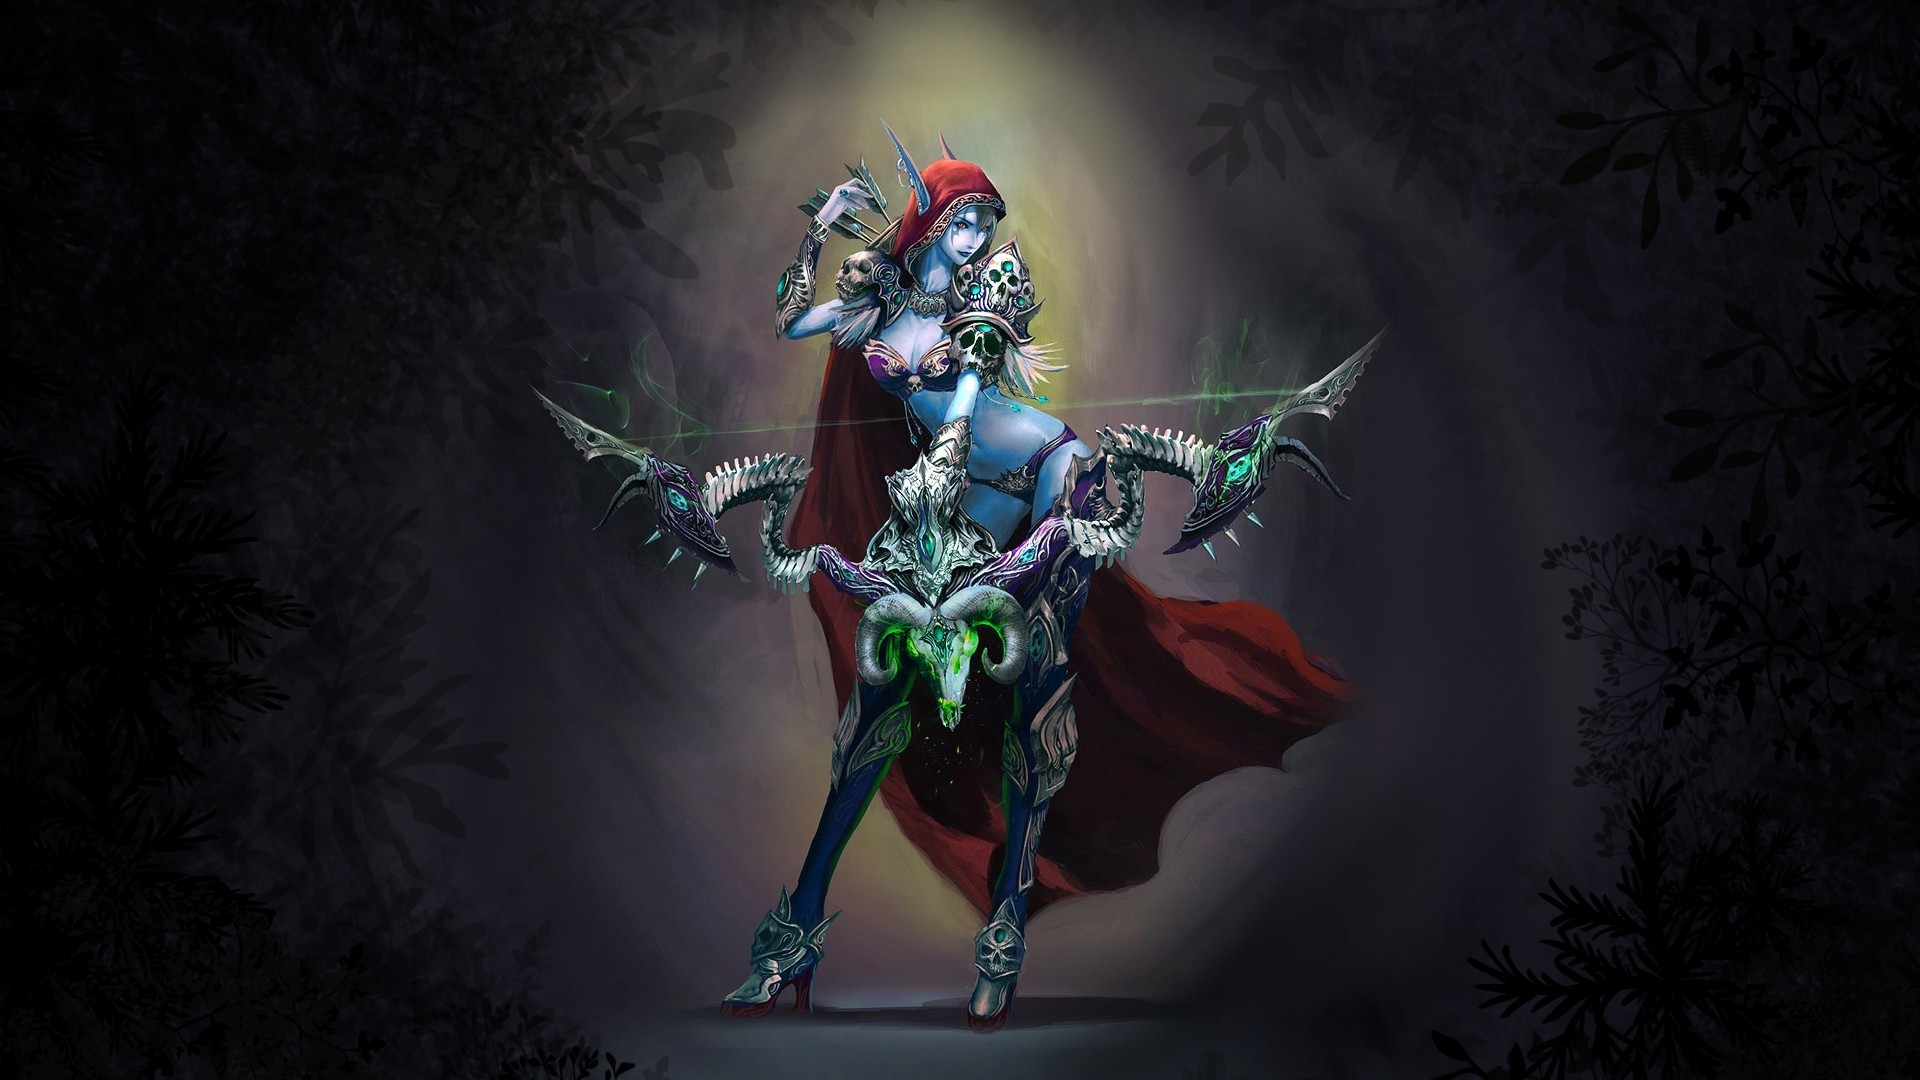 Res: 1920x1080, Sylvanas Windrunner, World of Warcraft